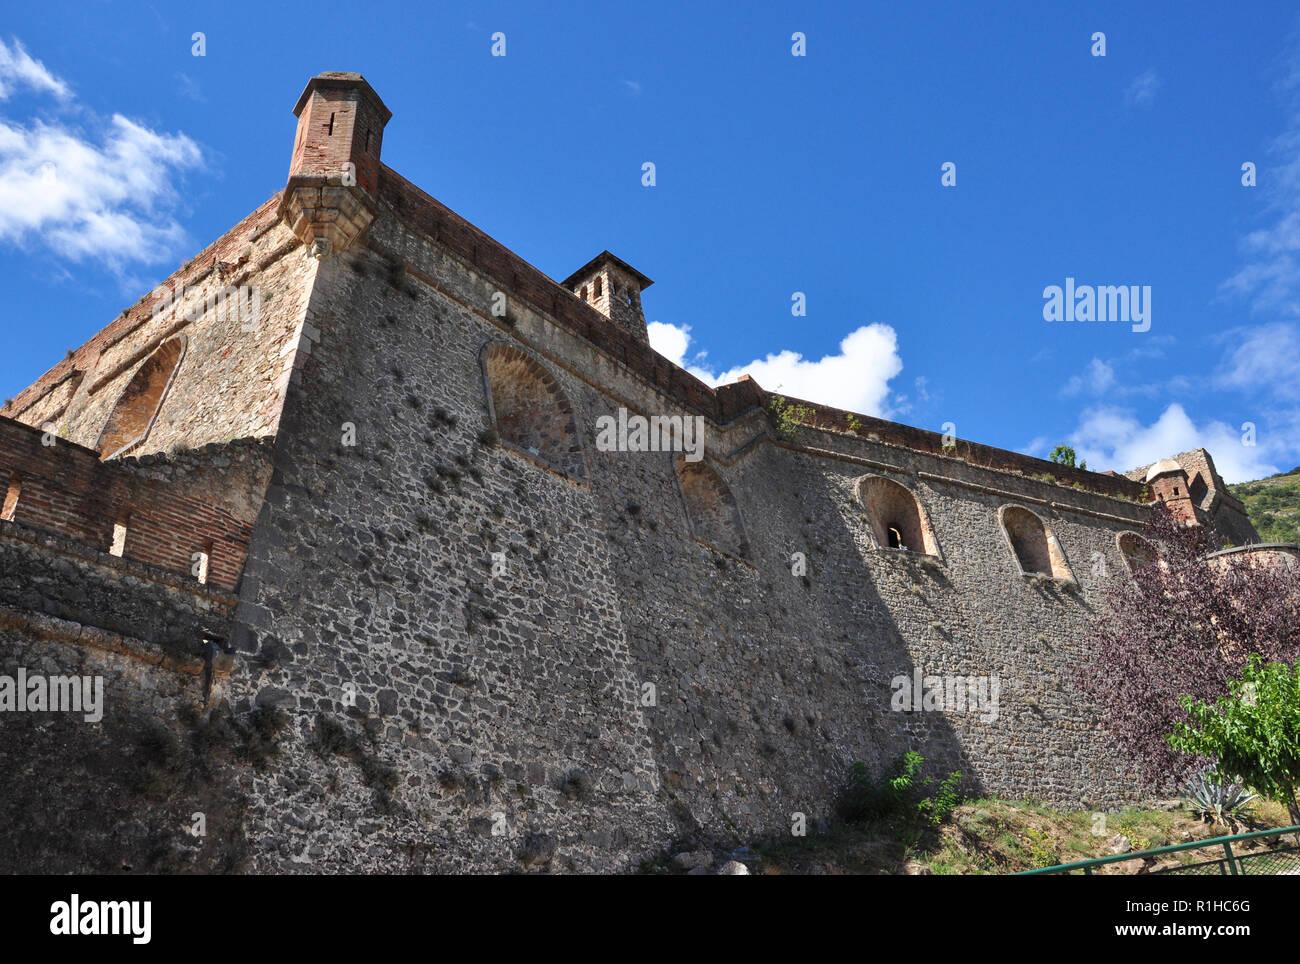 Fort Liberia, Villefranche-de-Conflent, Pyrenees-Orientales, Occitanie, France Stock Photo